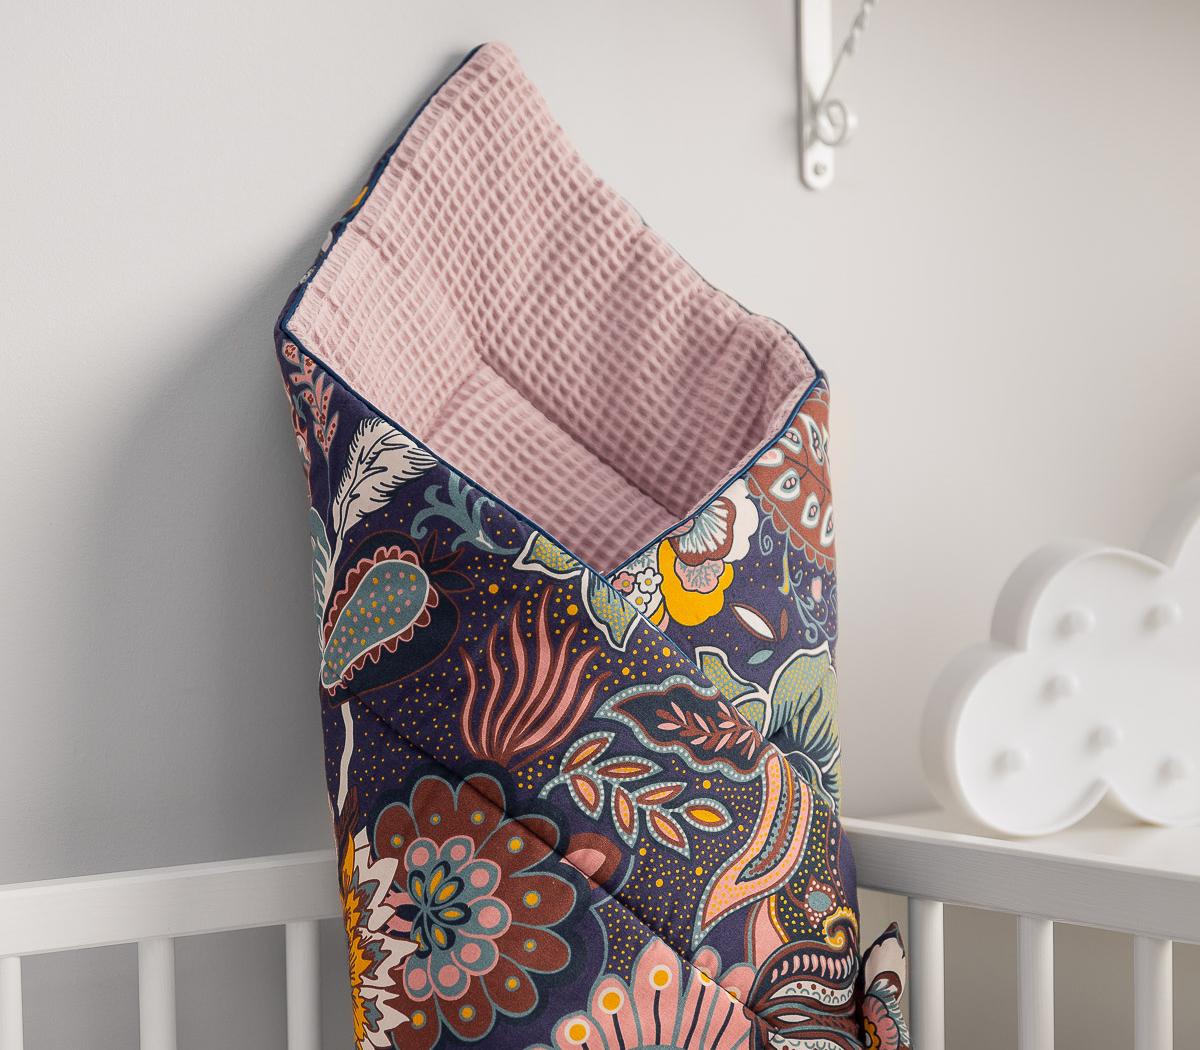 Baby Newborn Soft Swaddle Wrap Sleeping Bag Velvet Cotton Rozek Sensillo New